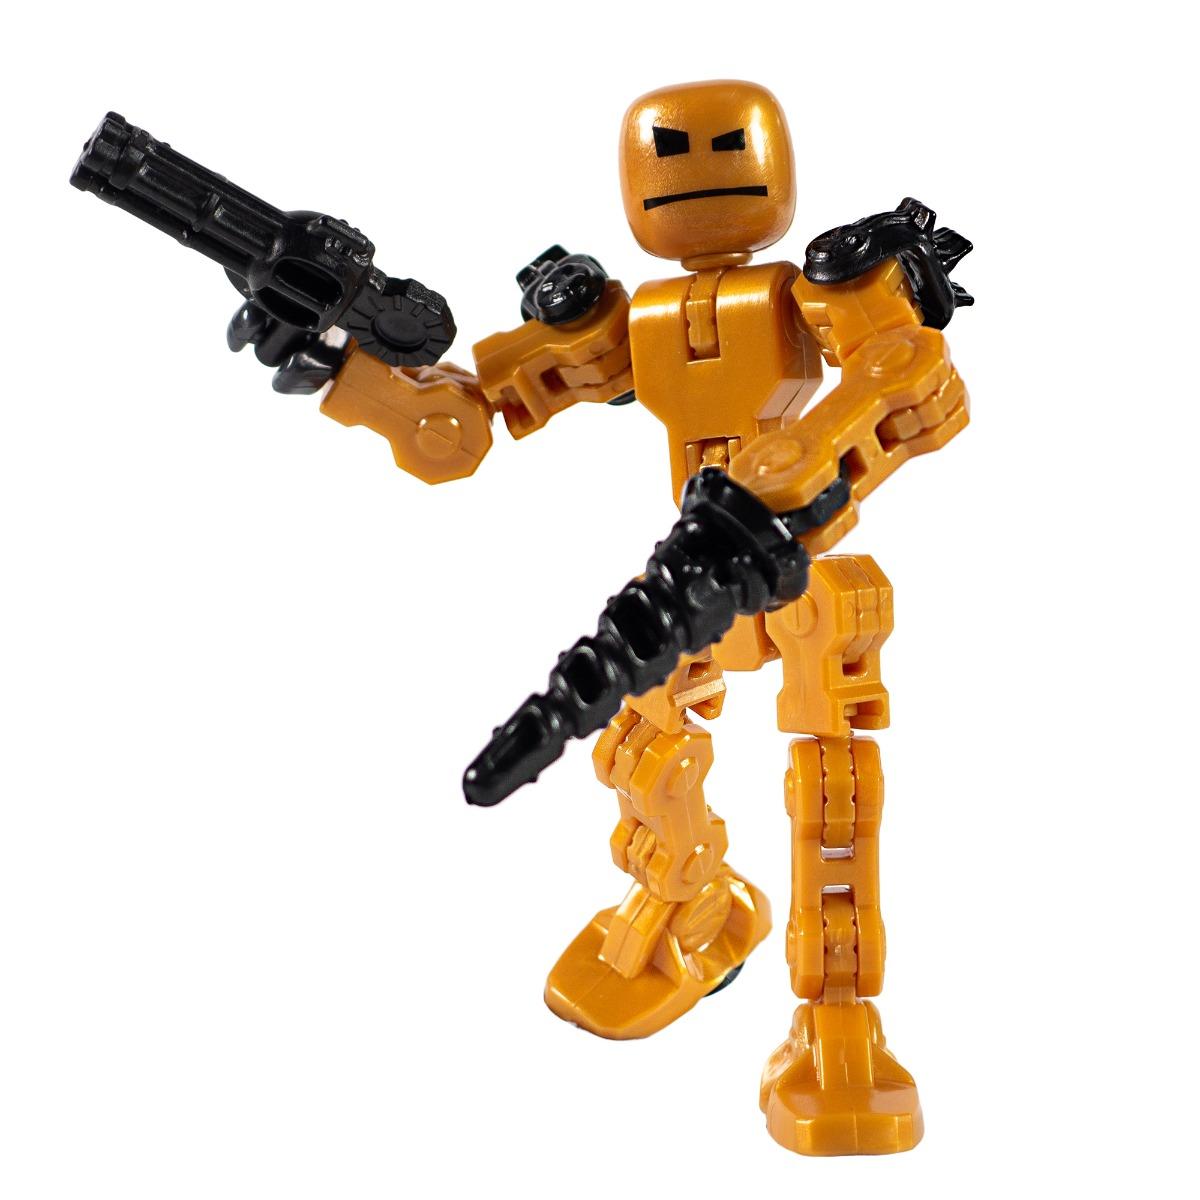 Figurina Robot articulat transformabil KlikBot, Warp